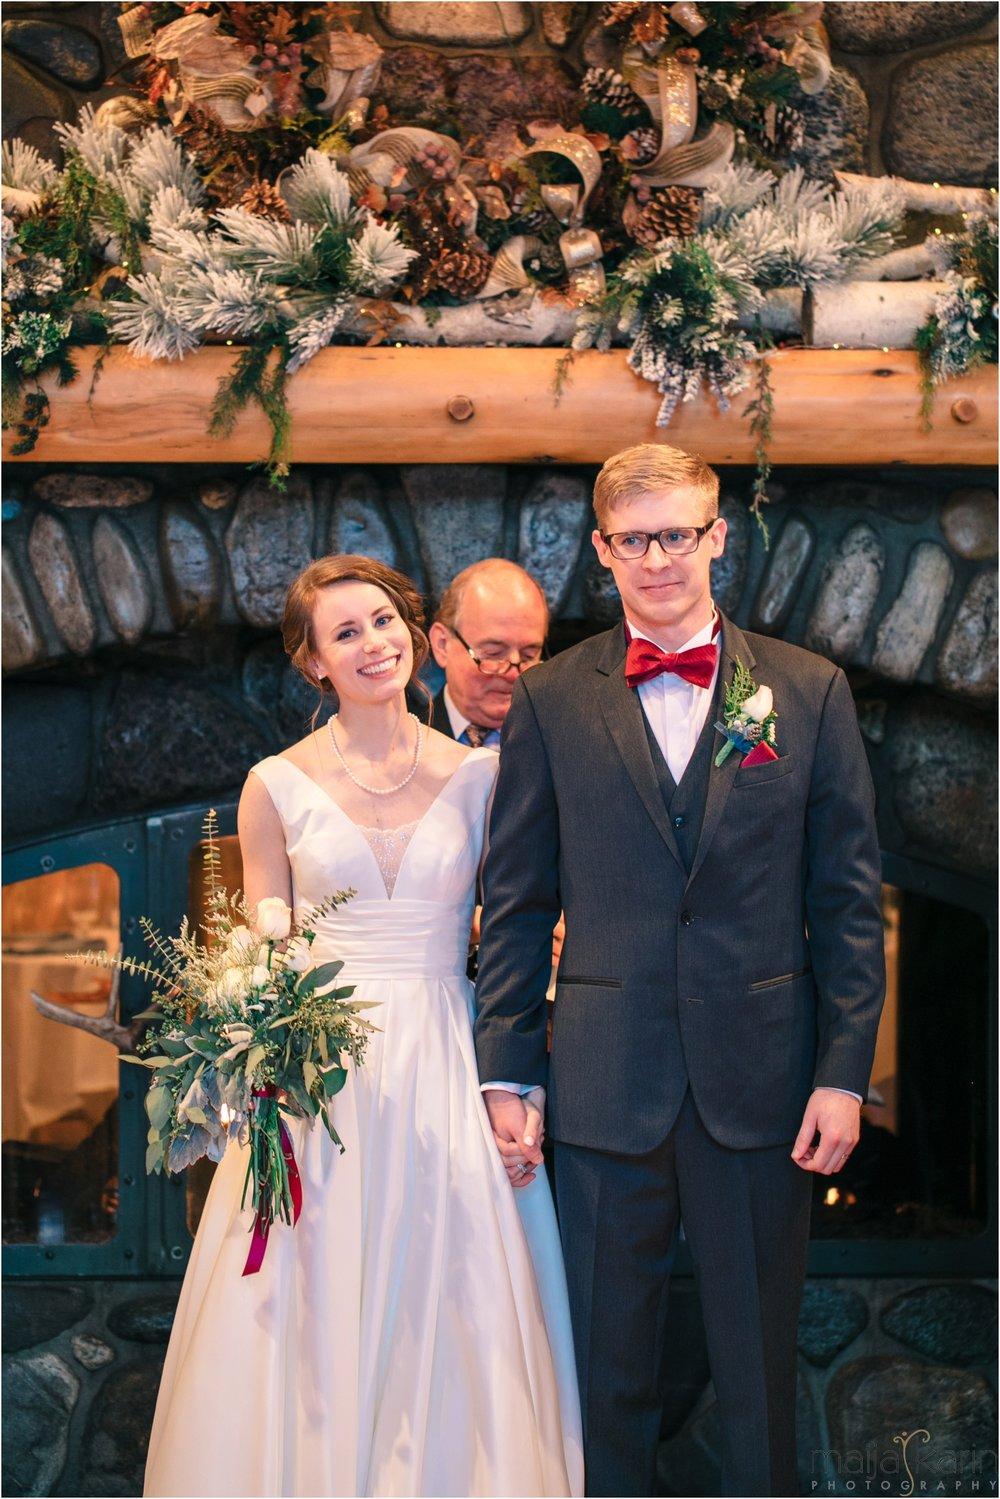 Mountain-Springs-Lodge-wedding-maija-karin-photography_0055.jpg